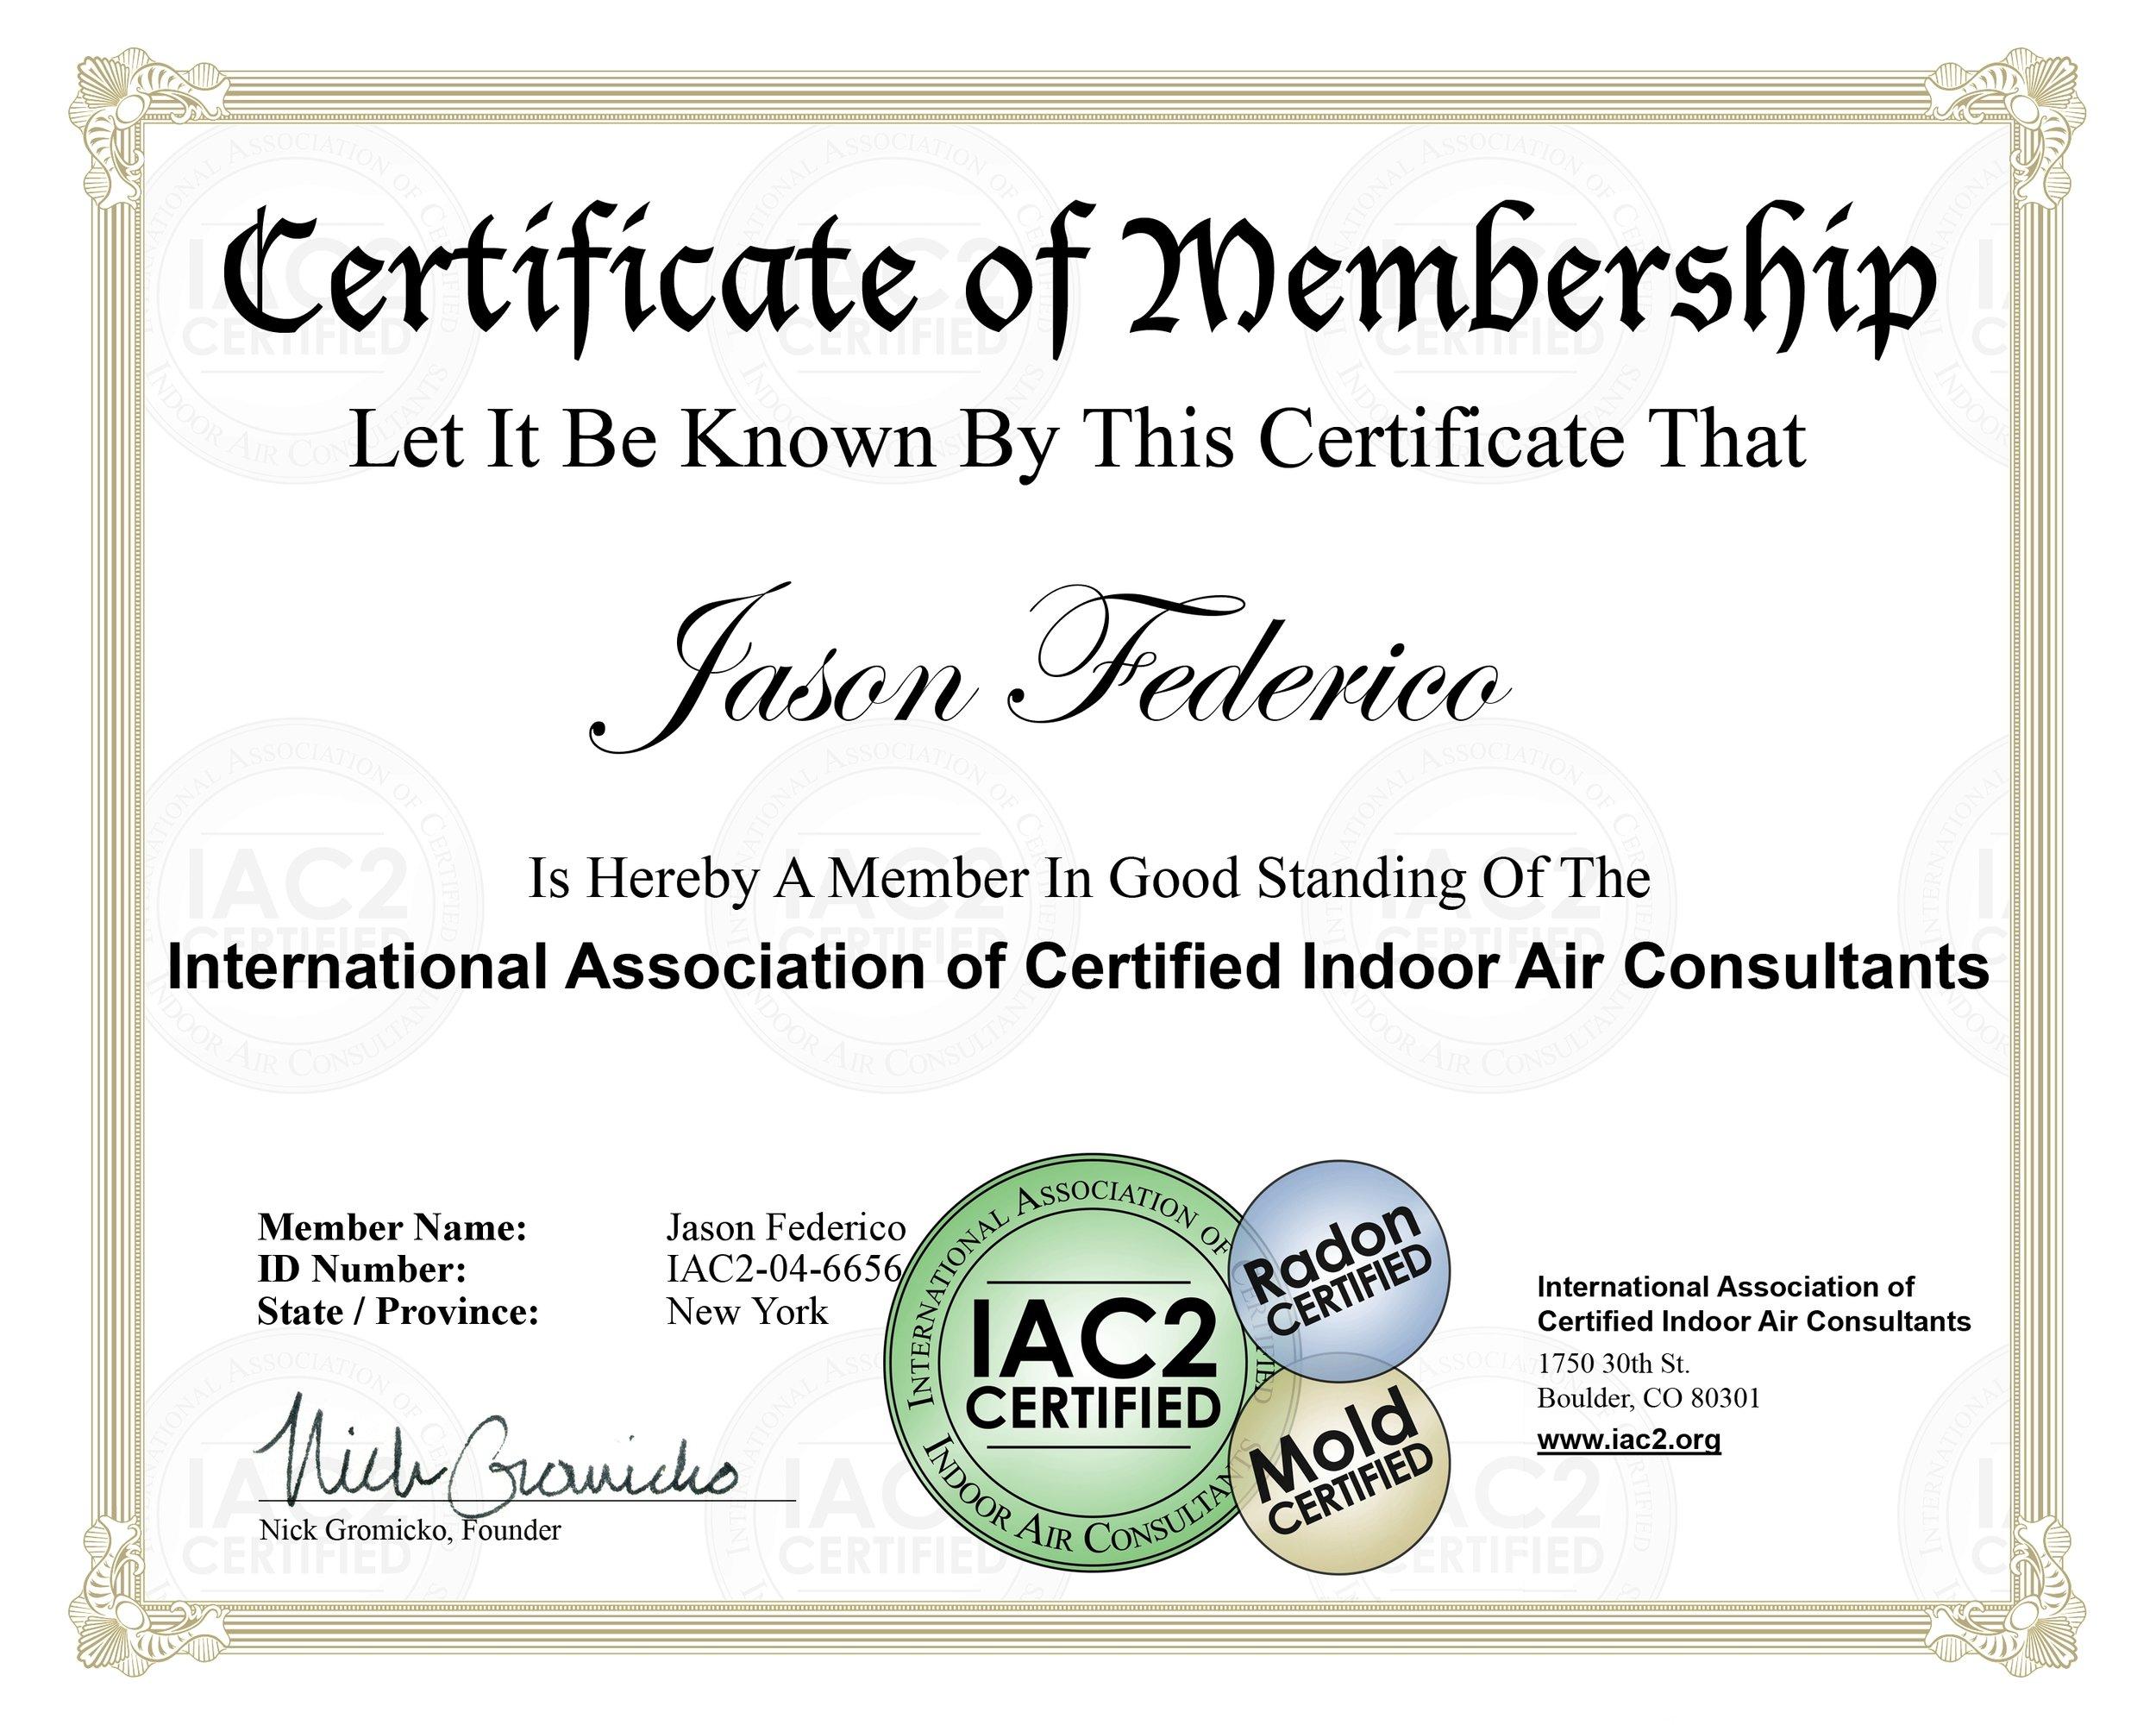 Jason Federico IAC2 Certifiacte.jpg